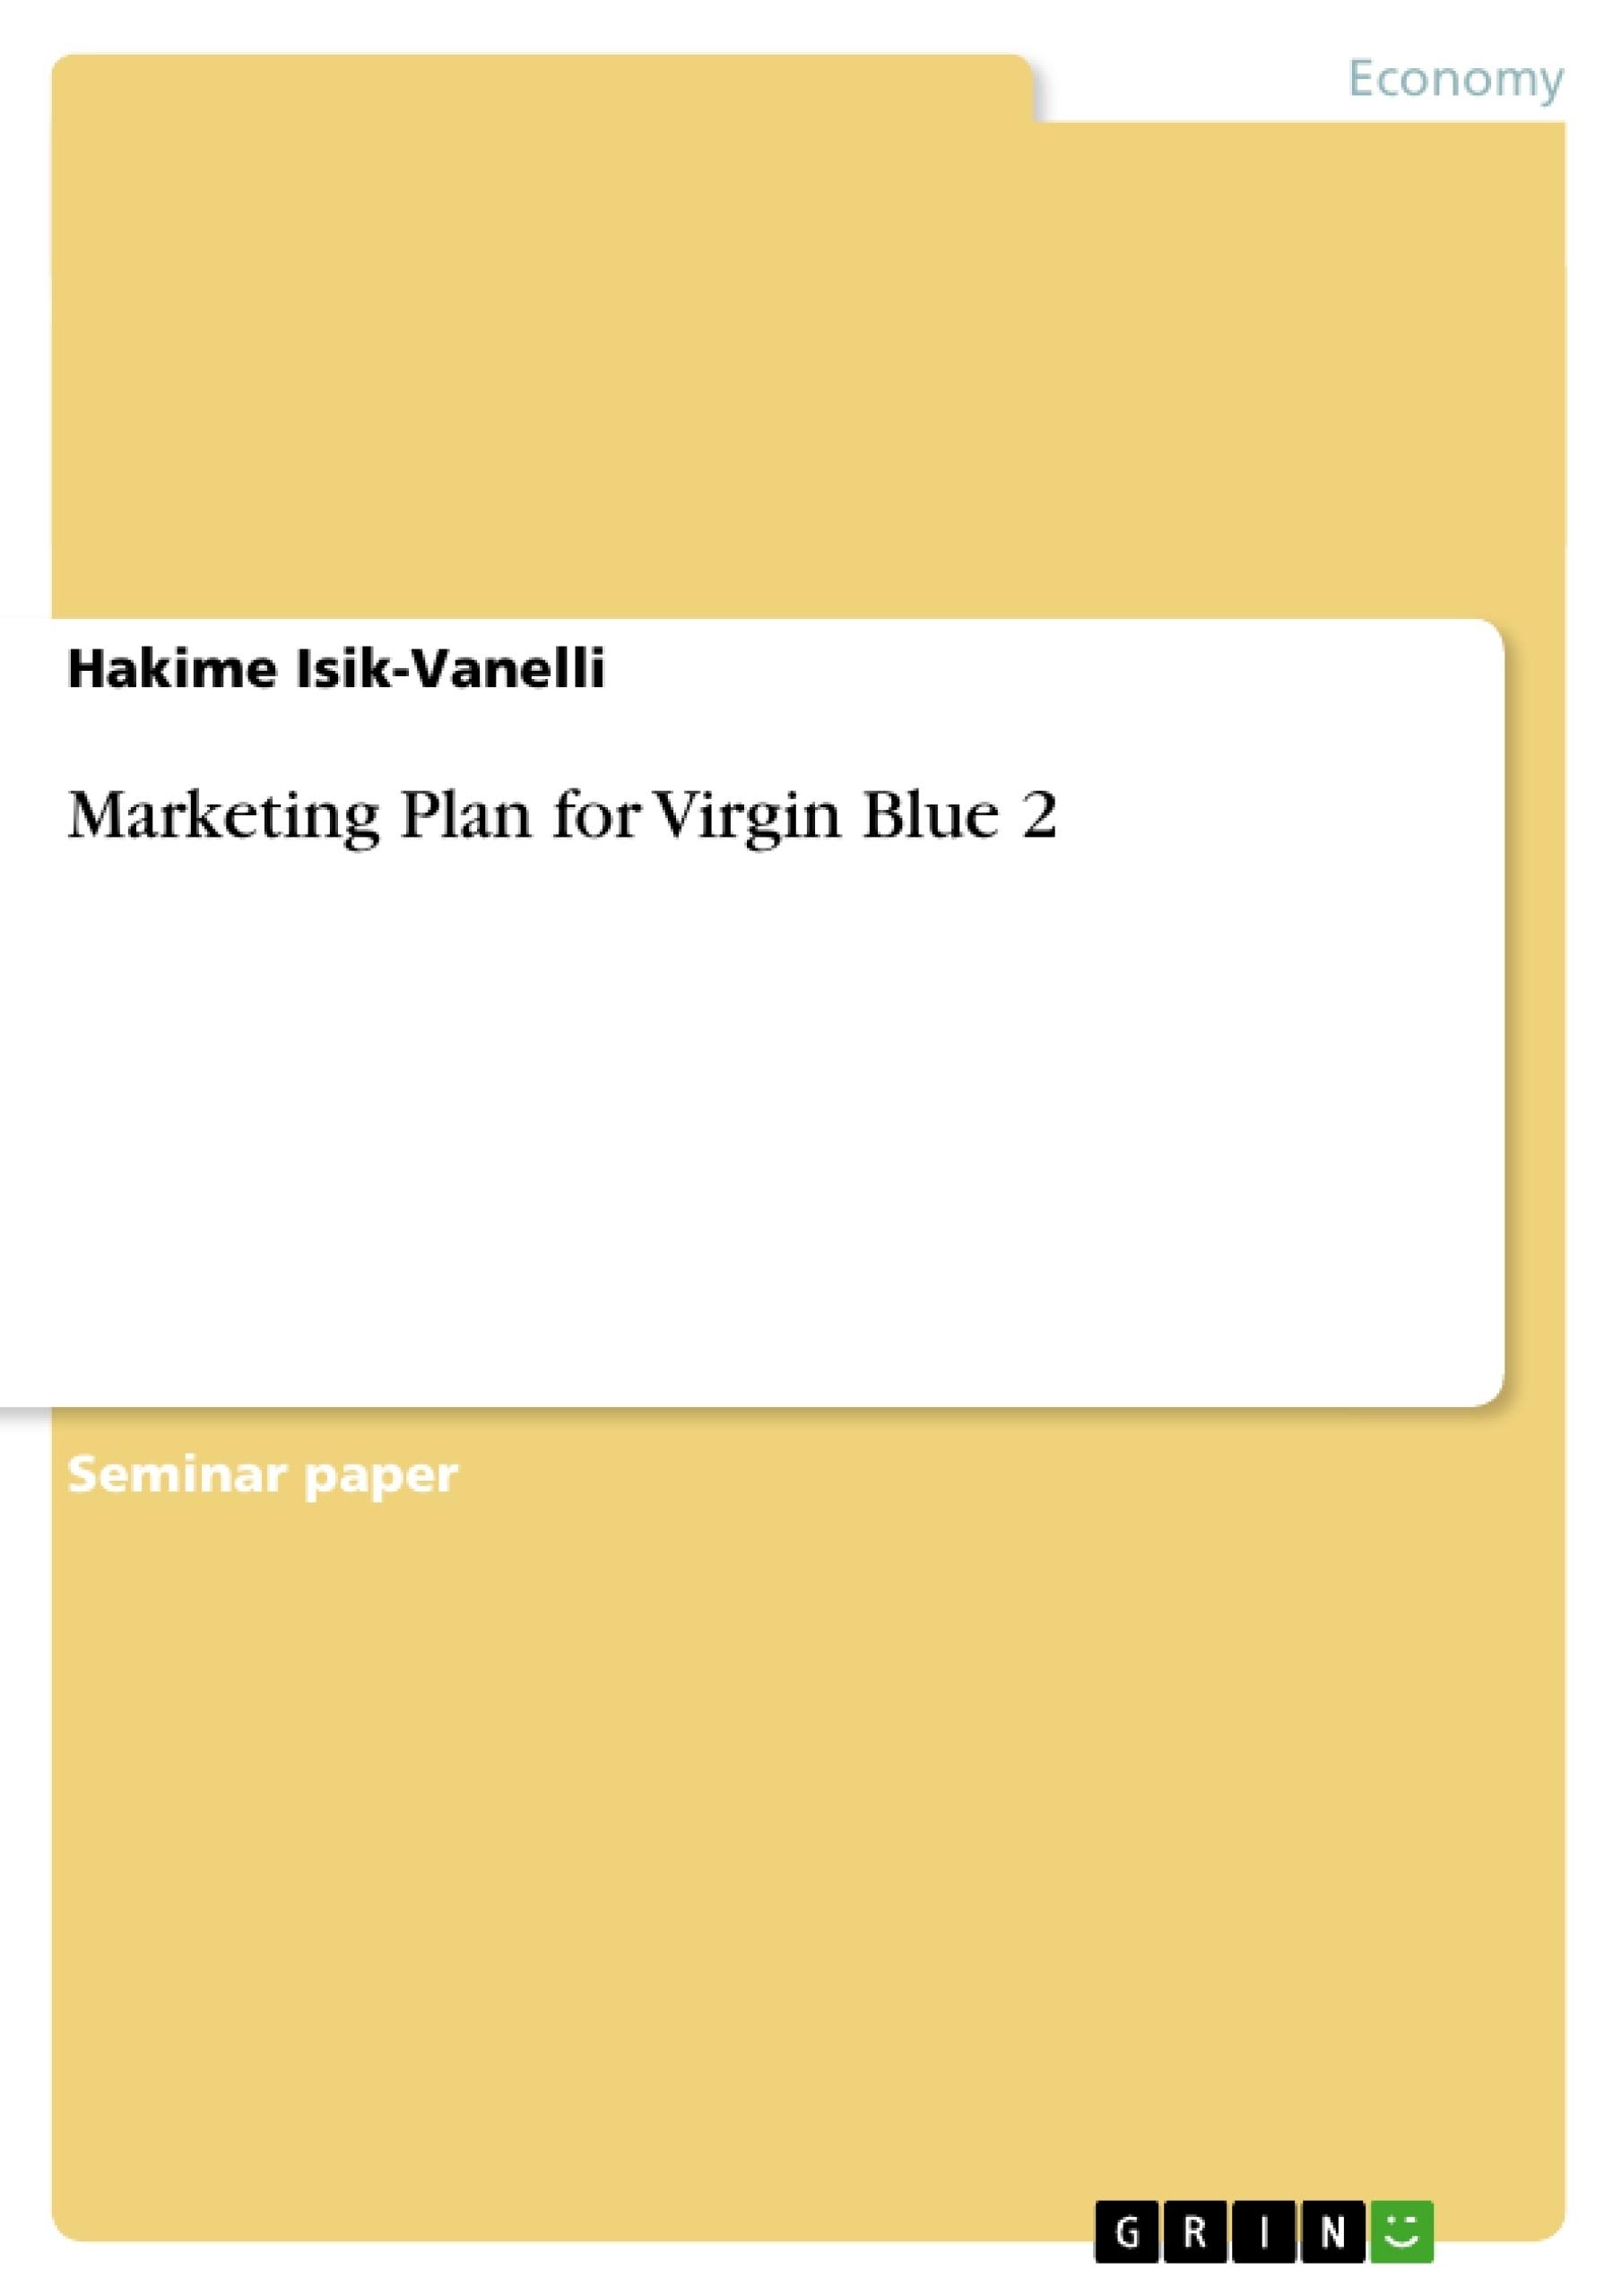 Title: Marketing Plan for Virgin Blue 2